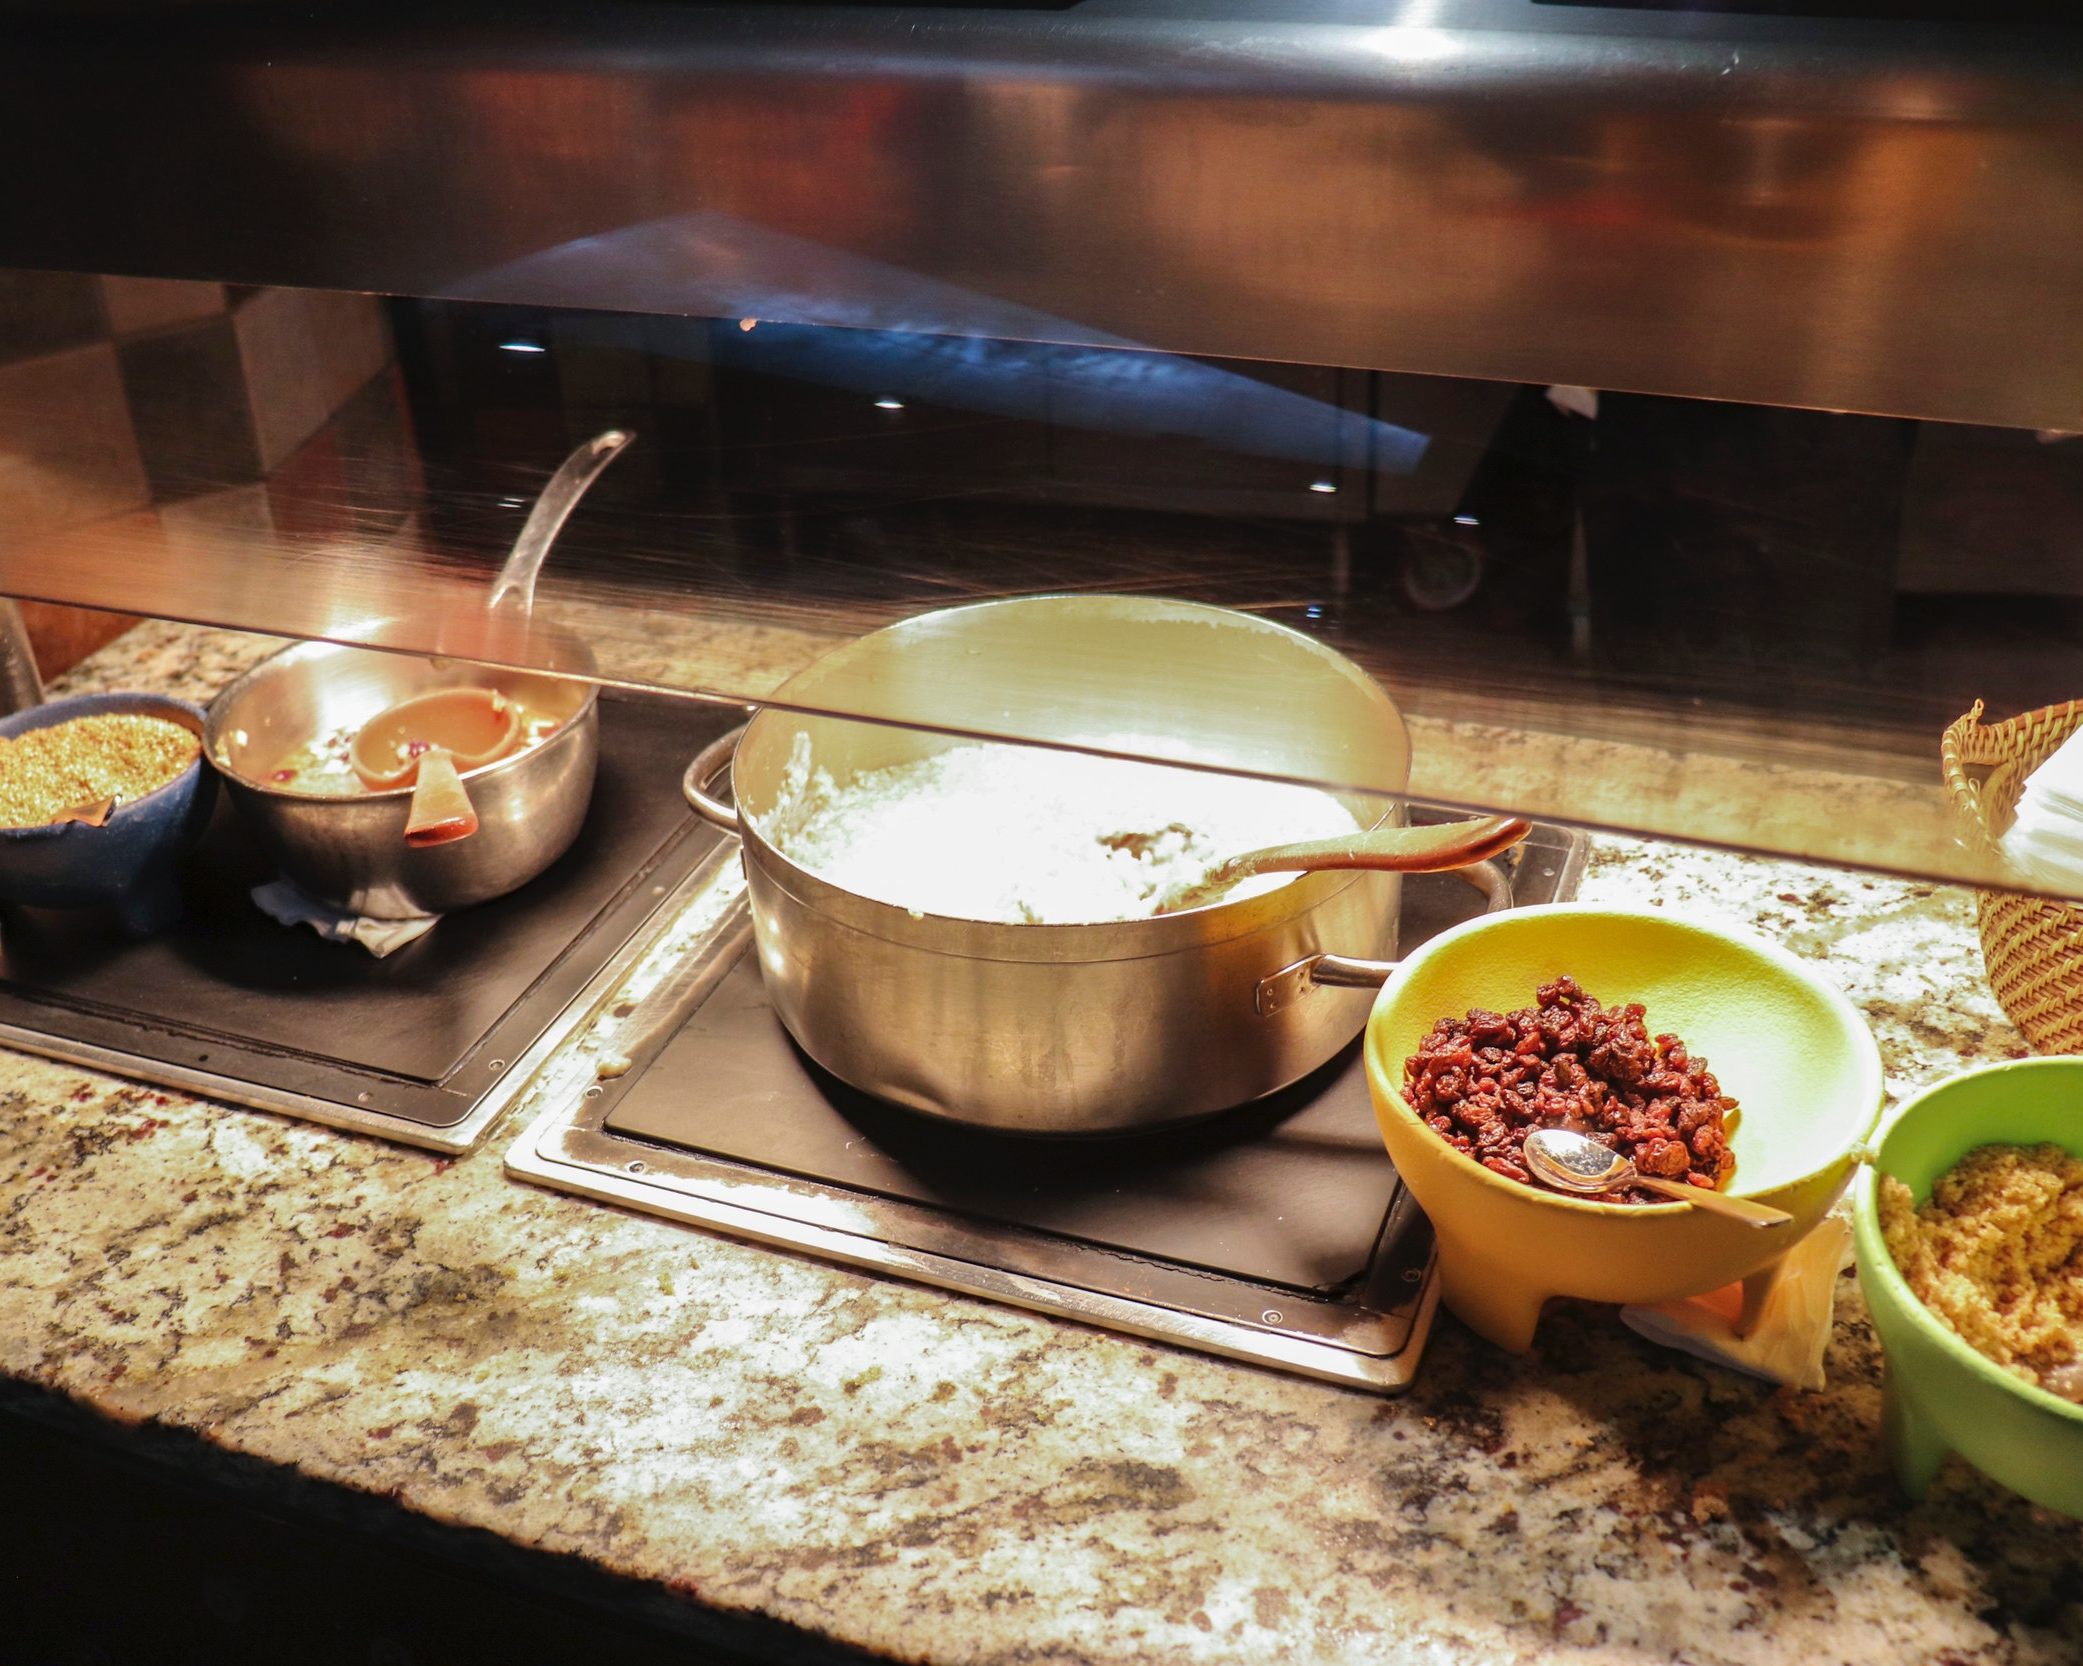 Oatmeal, Quinoa, & toppings.